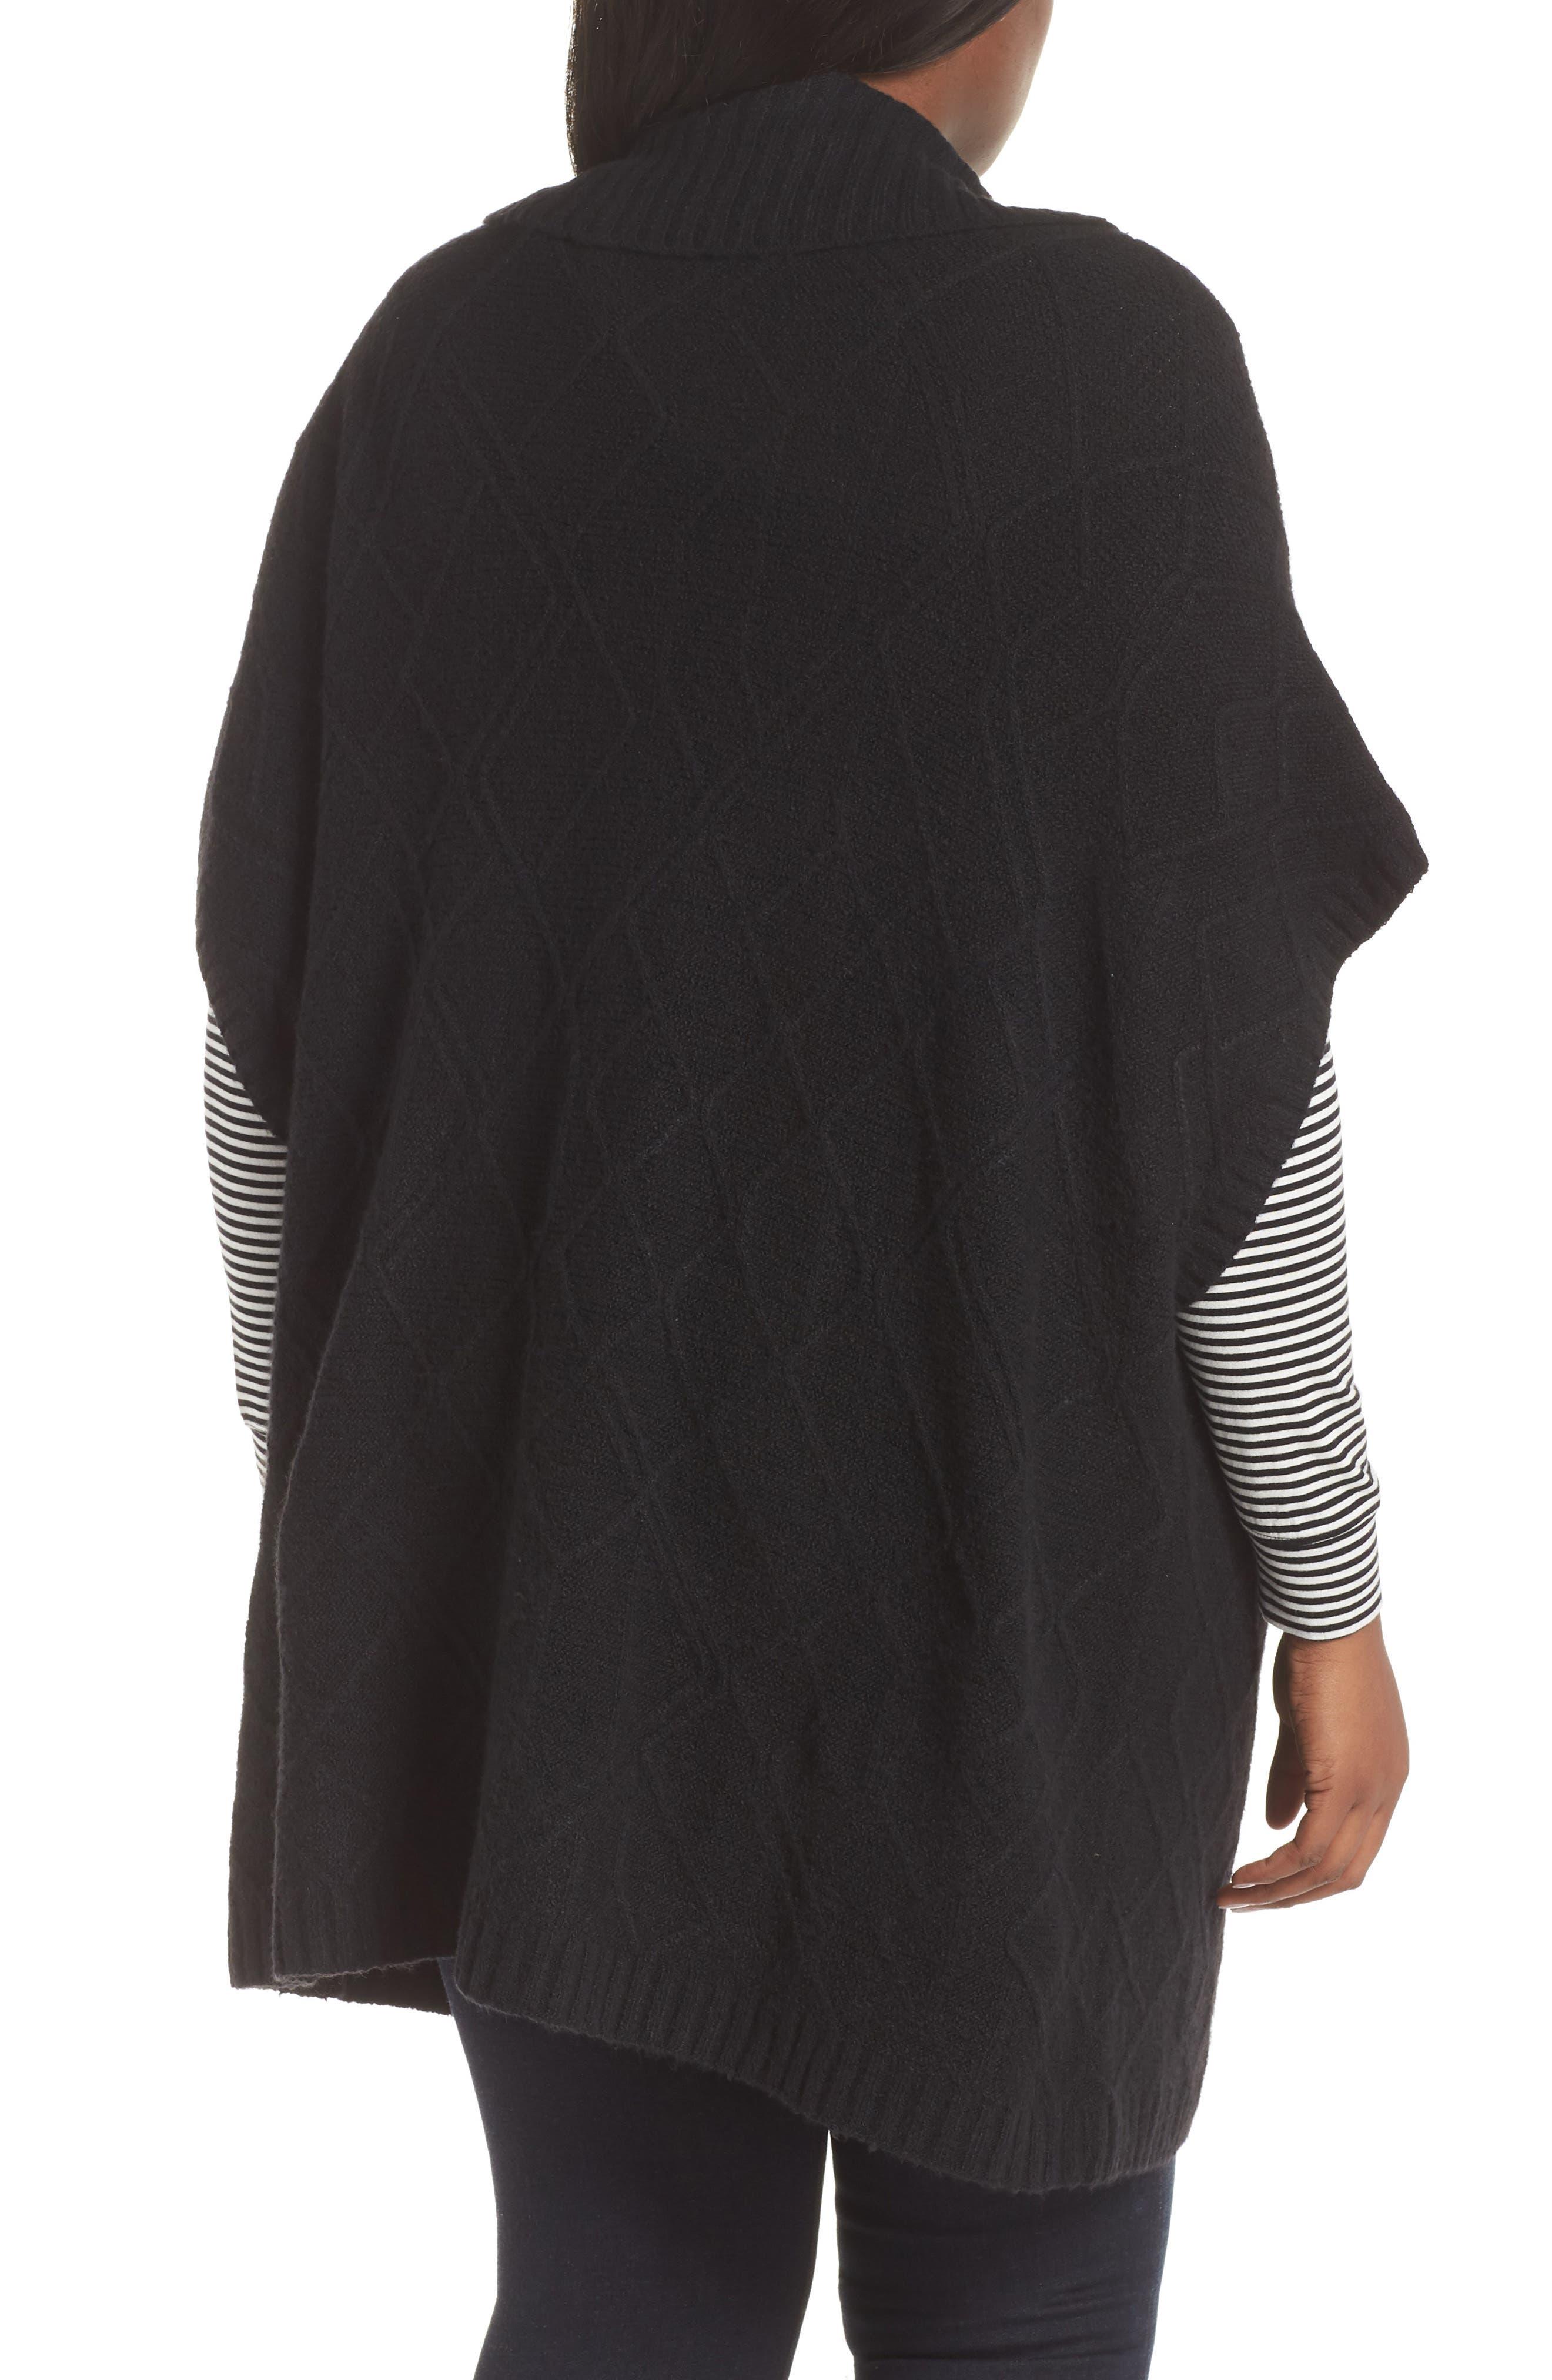 Poncho Sweater,                             Alternate thumbnail 2, color,                             BLACK